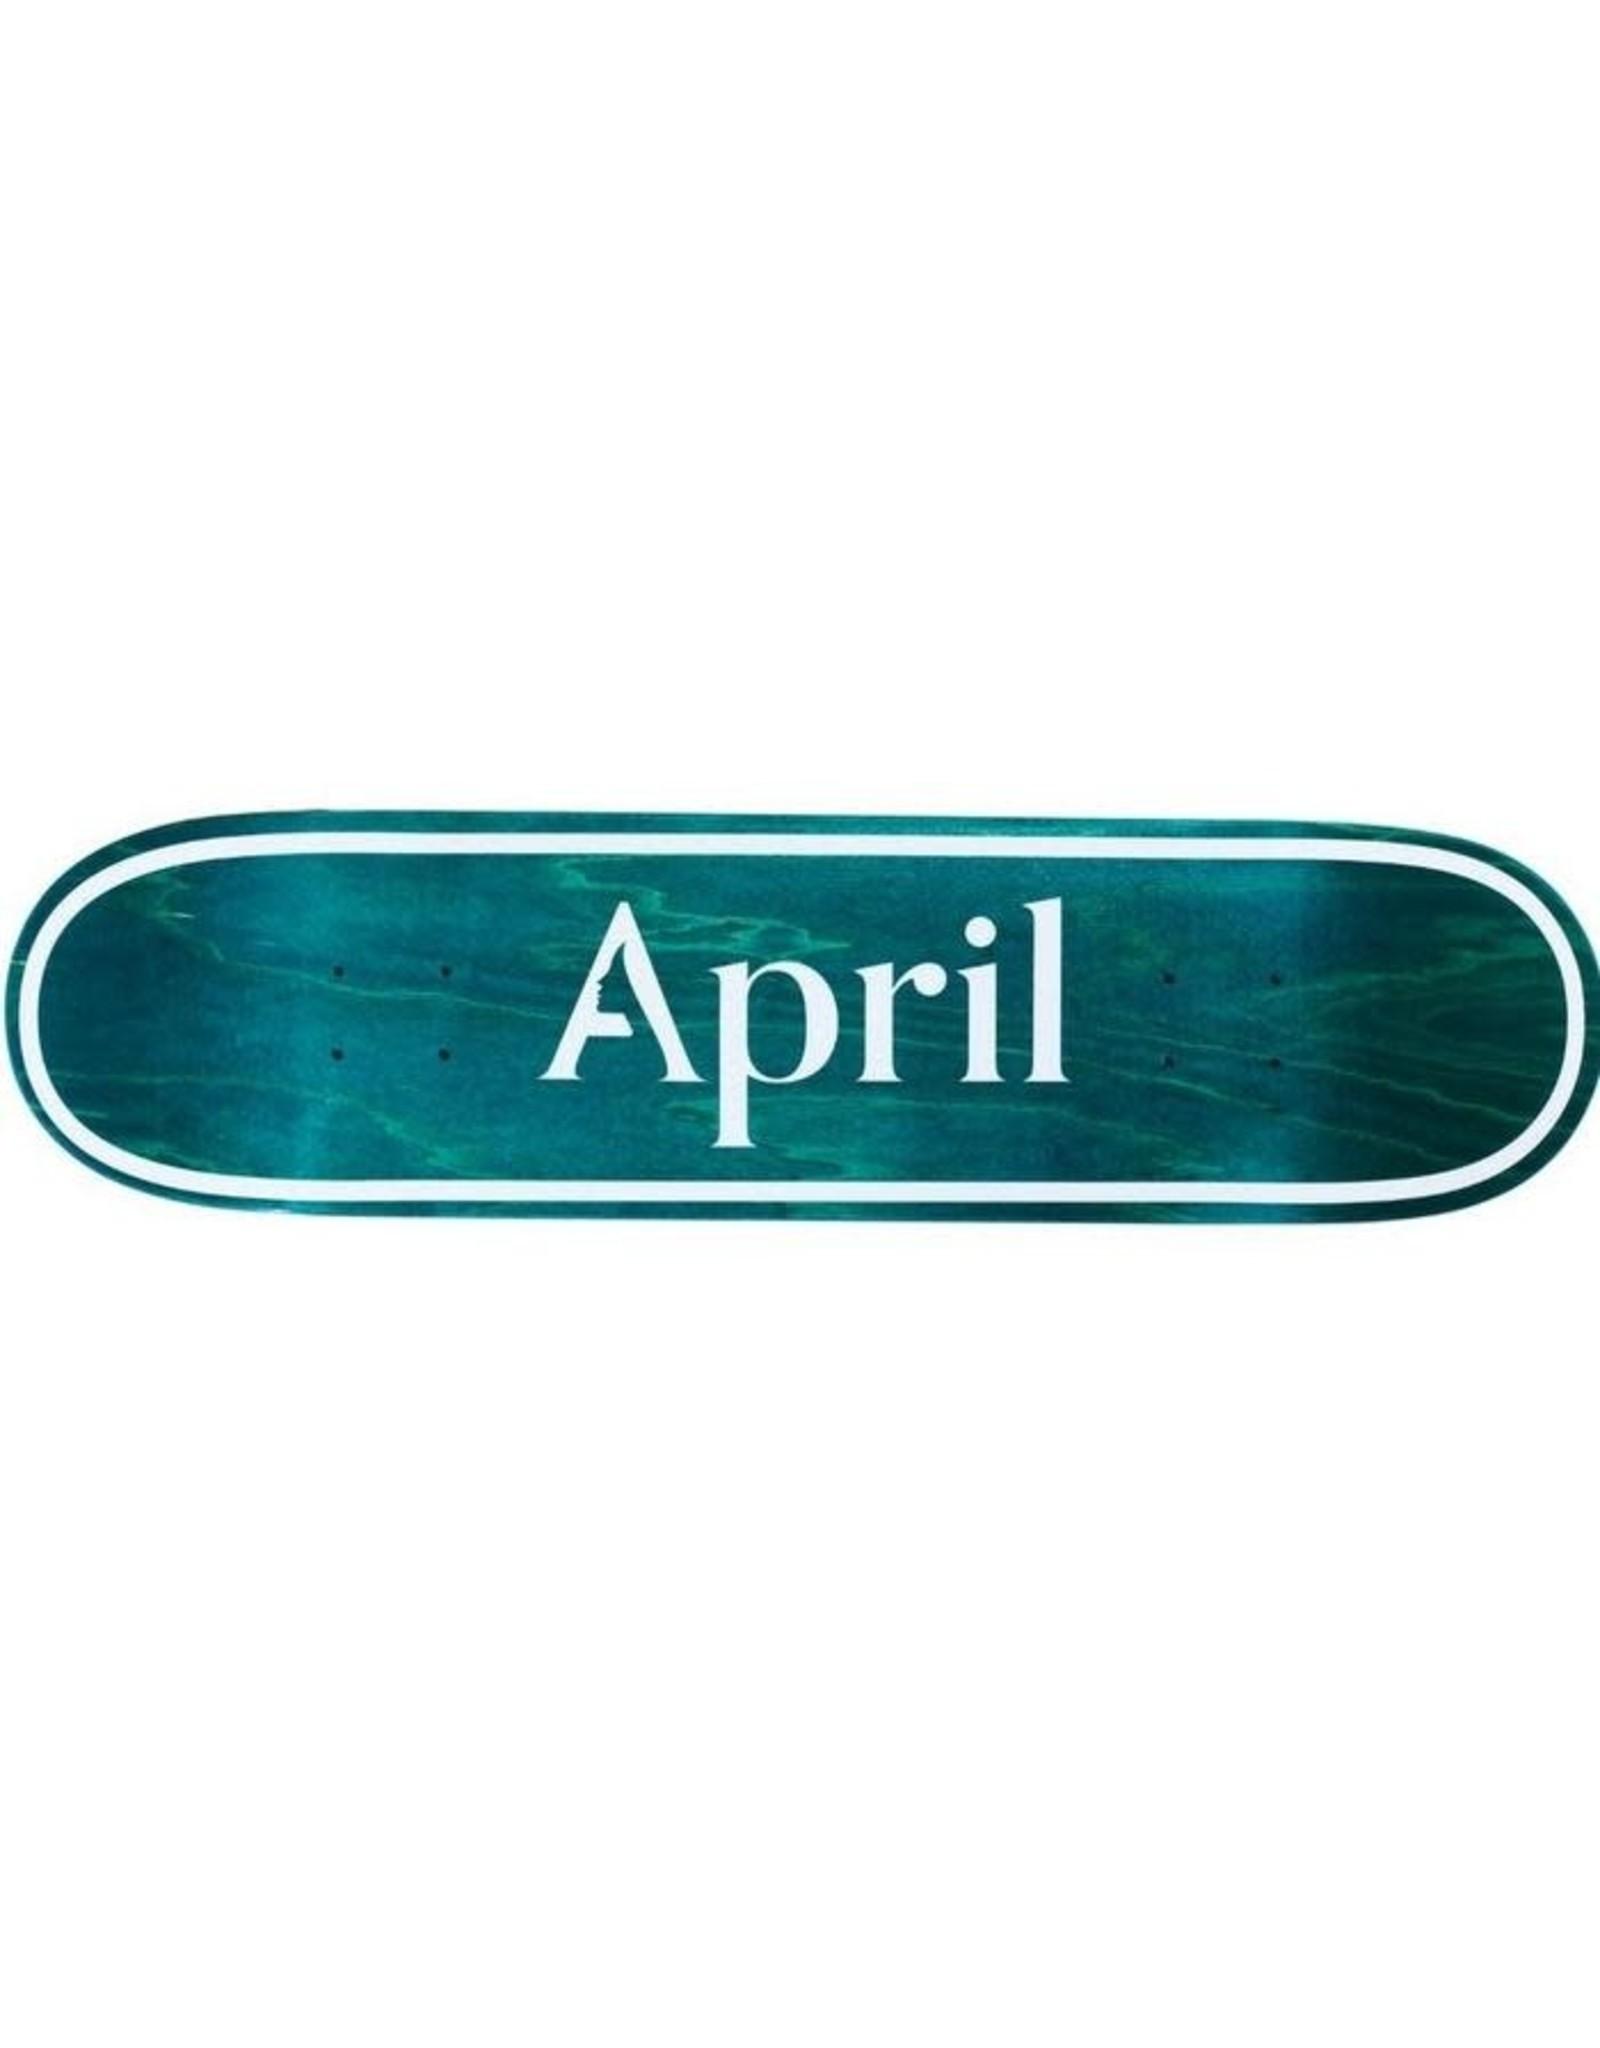 April Skateboard April Skateboard - Skateboard OG logo invert mint